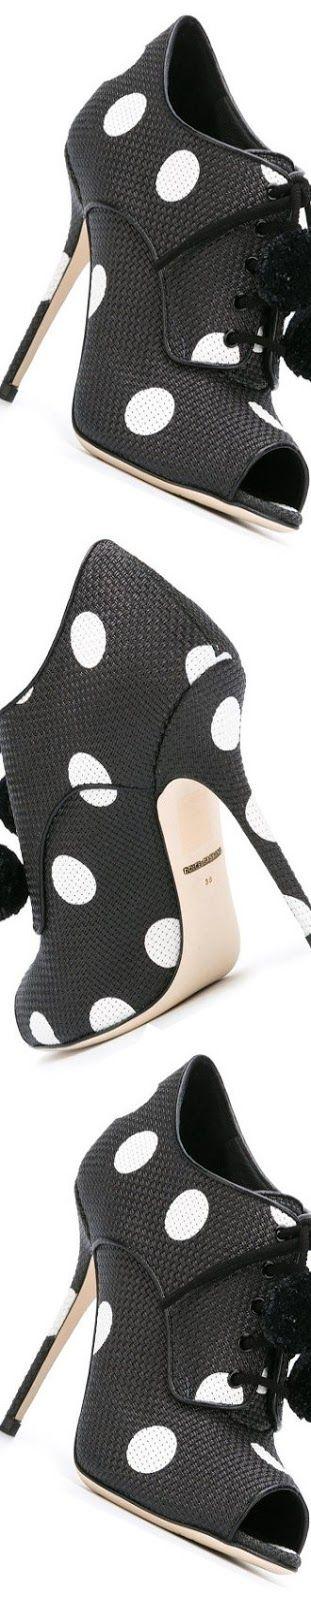 Shop Farfetch.Com Dolce & Gabbana Polka Dot Open-Toe Pumps